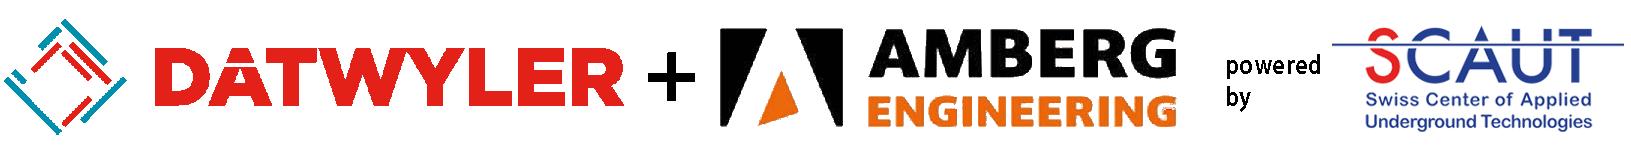 Edge Computing Underground logo